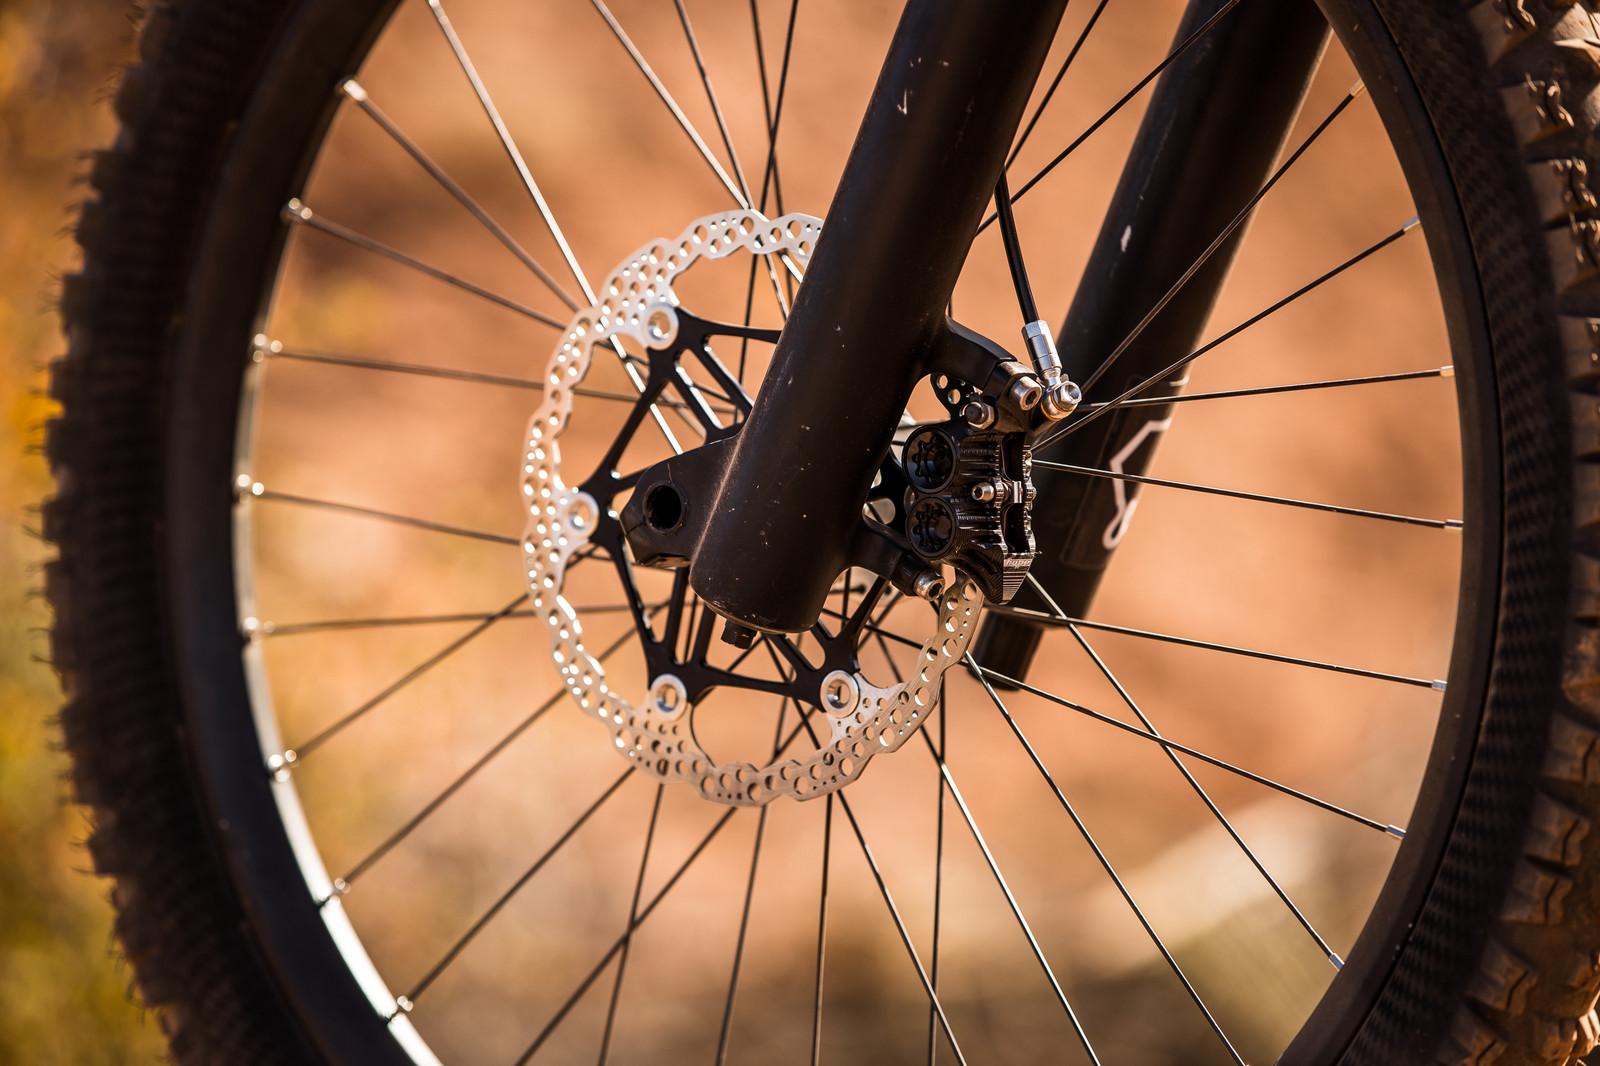 Hope Tech V4 Brakes on Andreu Lacondeguy's YT TUES at Rampage 2019 - RAMPAGE BIKE - Andreu Lacondeguy's YT TUES - Mountain Biking Pictures - Vital MTB